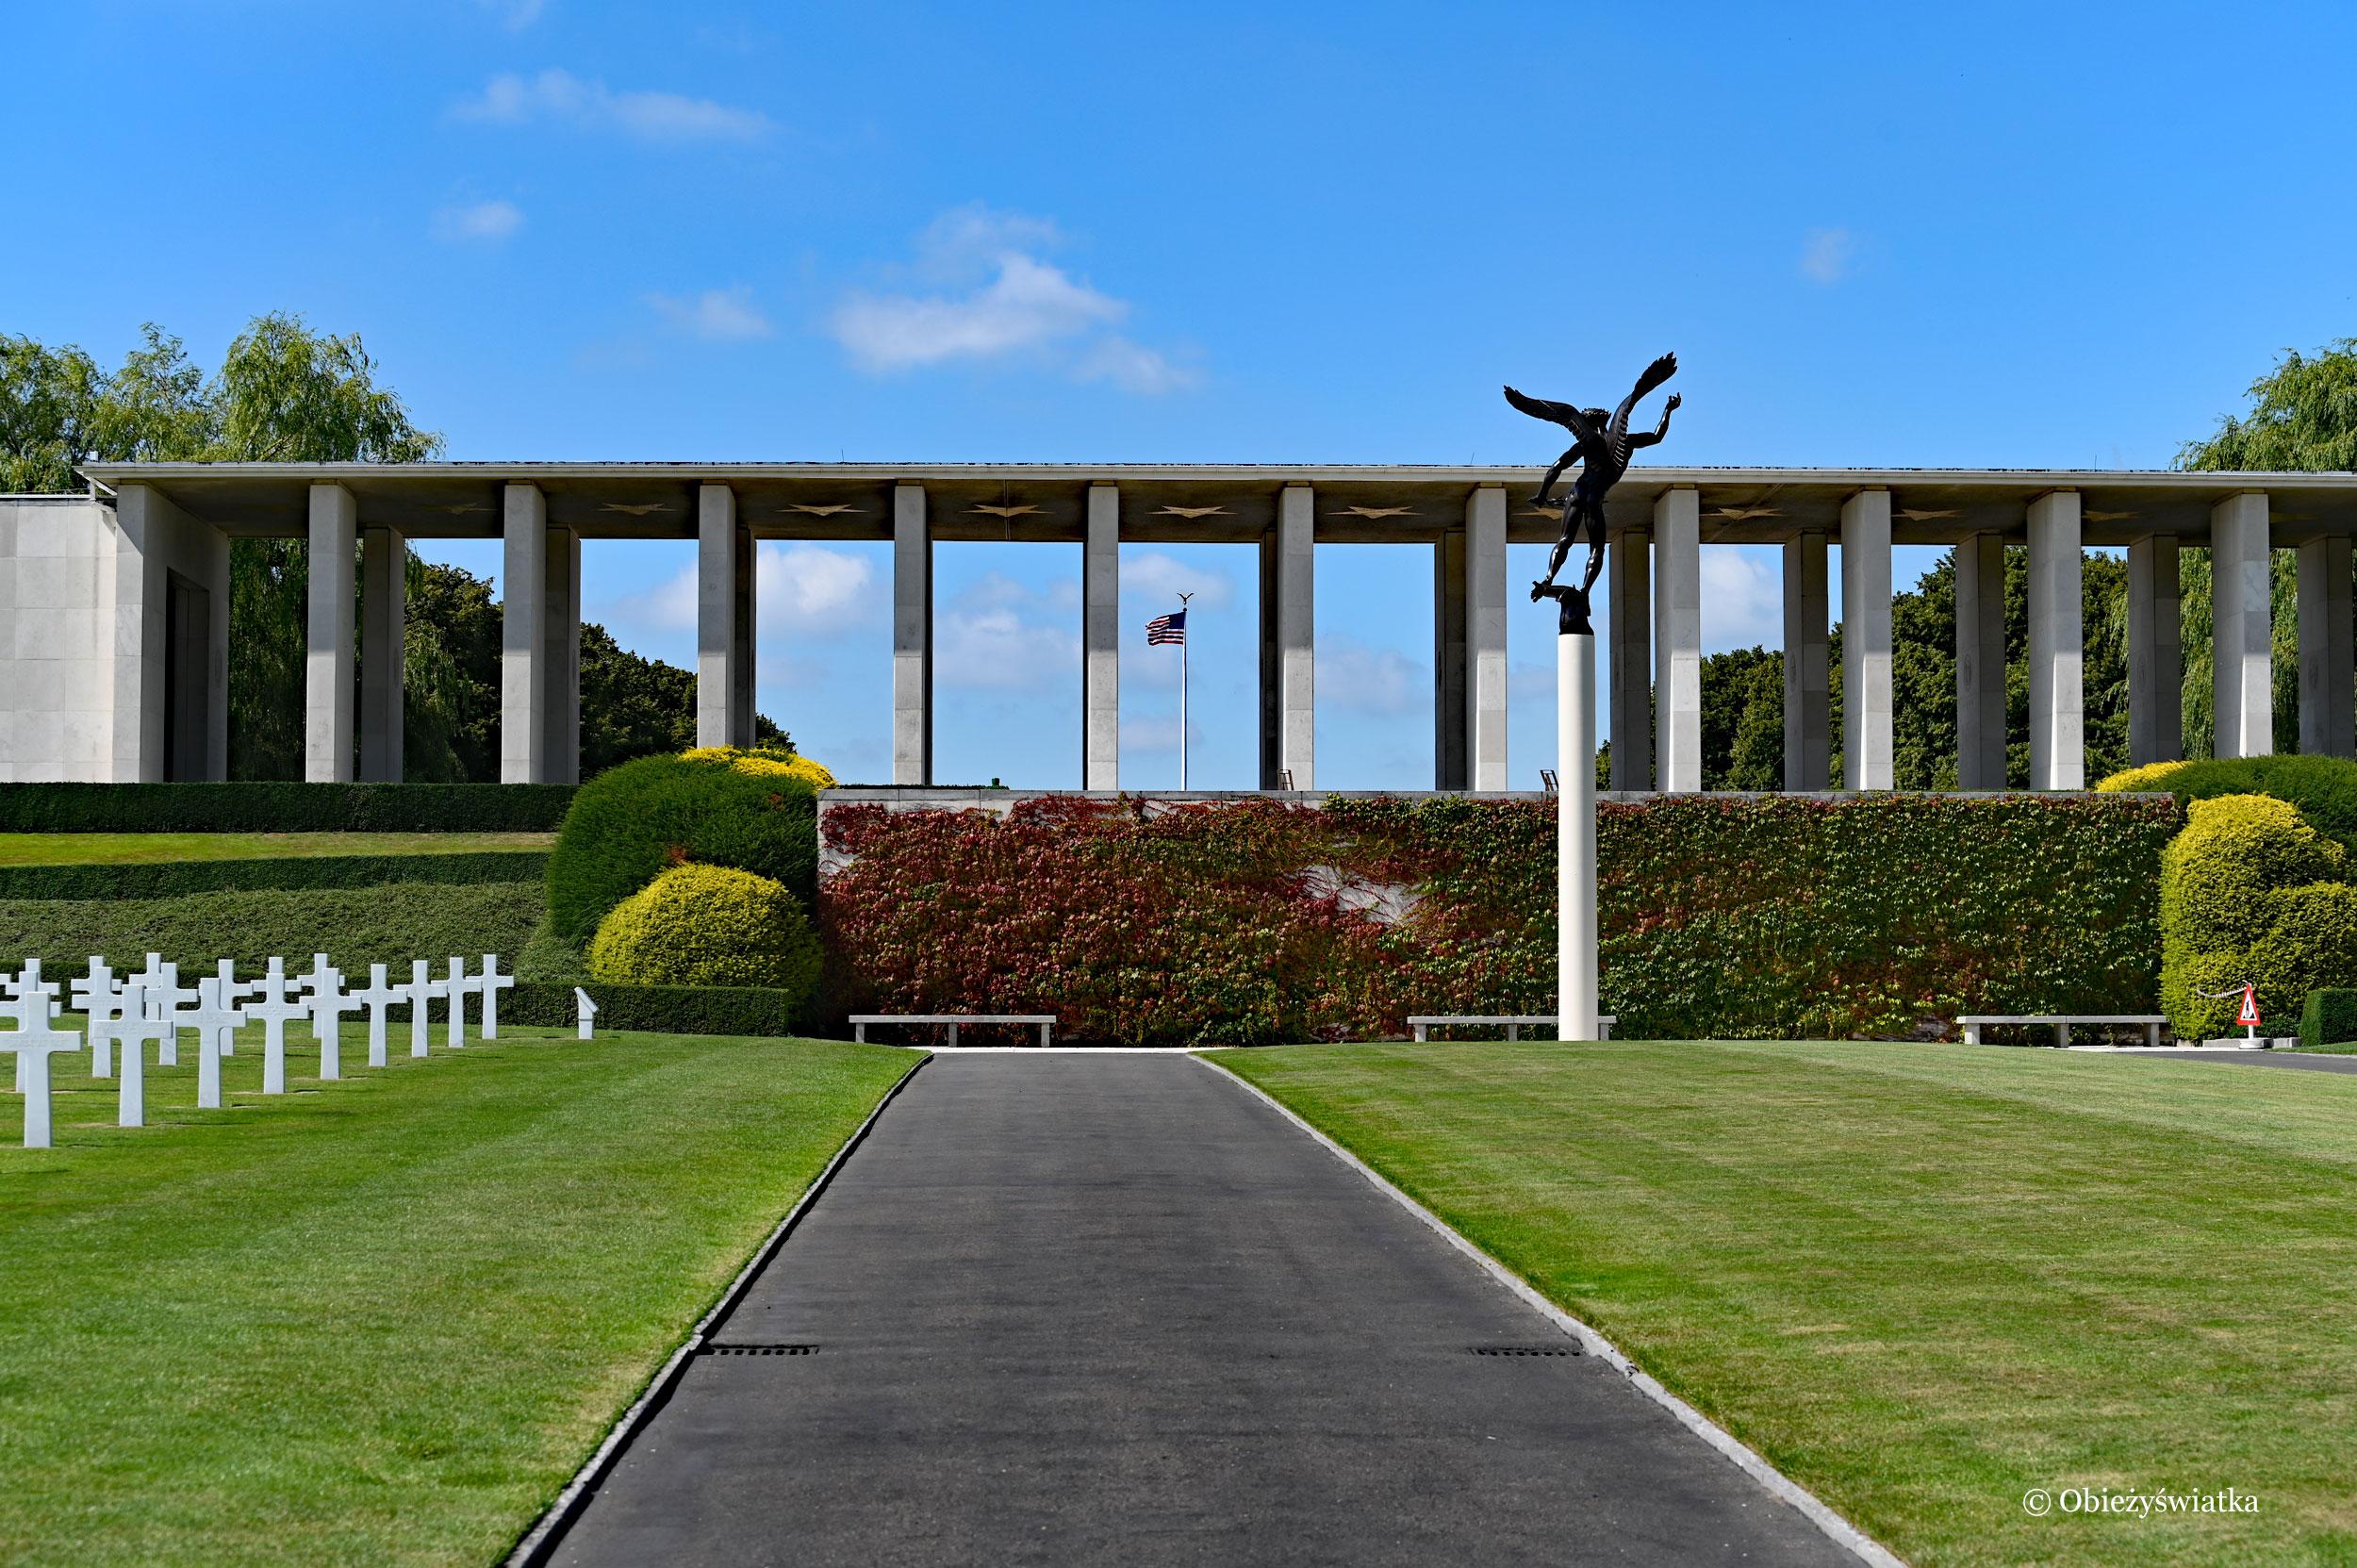 Na cmentarzu - American Cementery and Memorial, Belgia